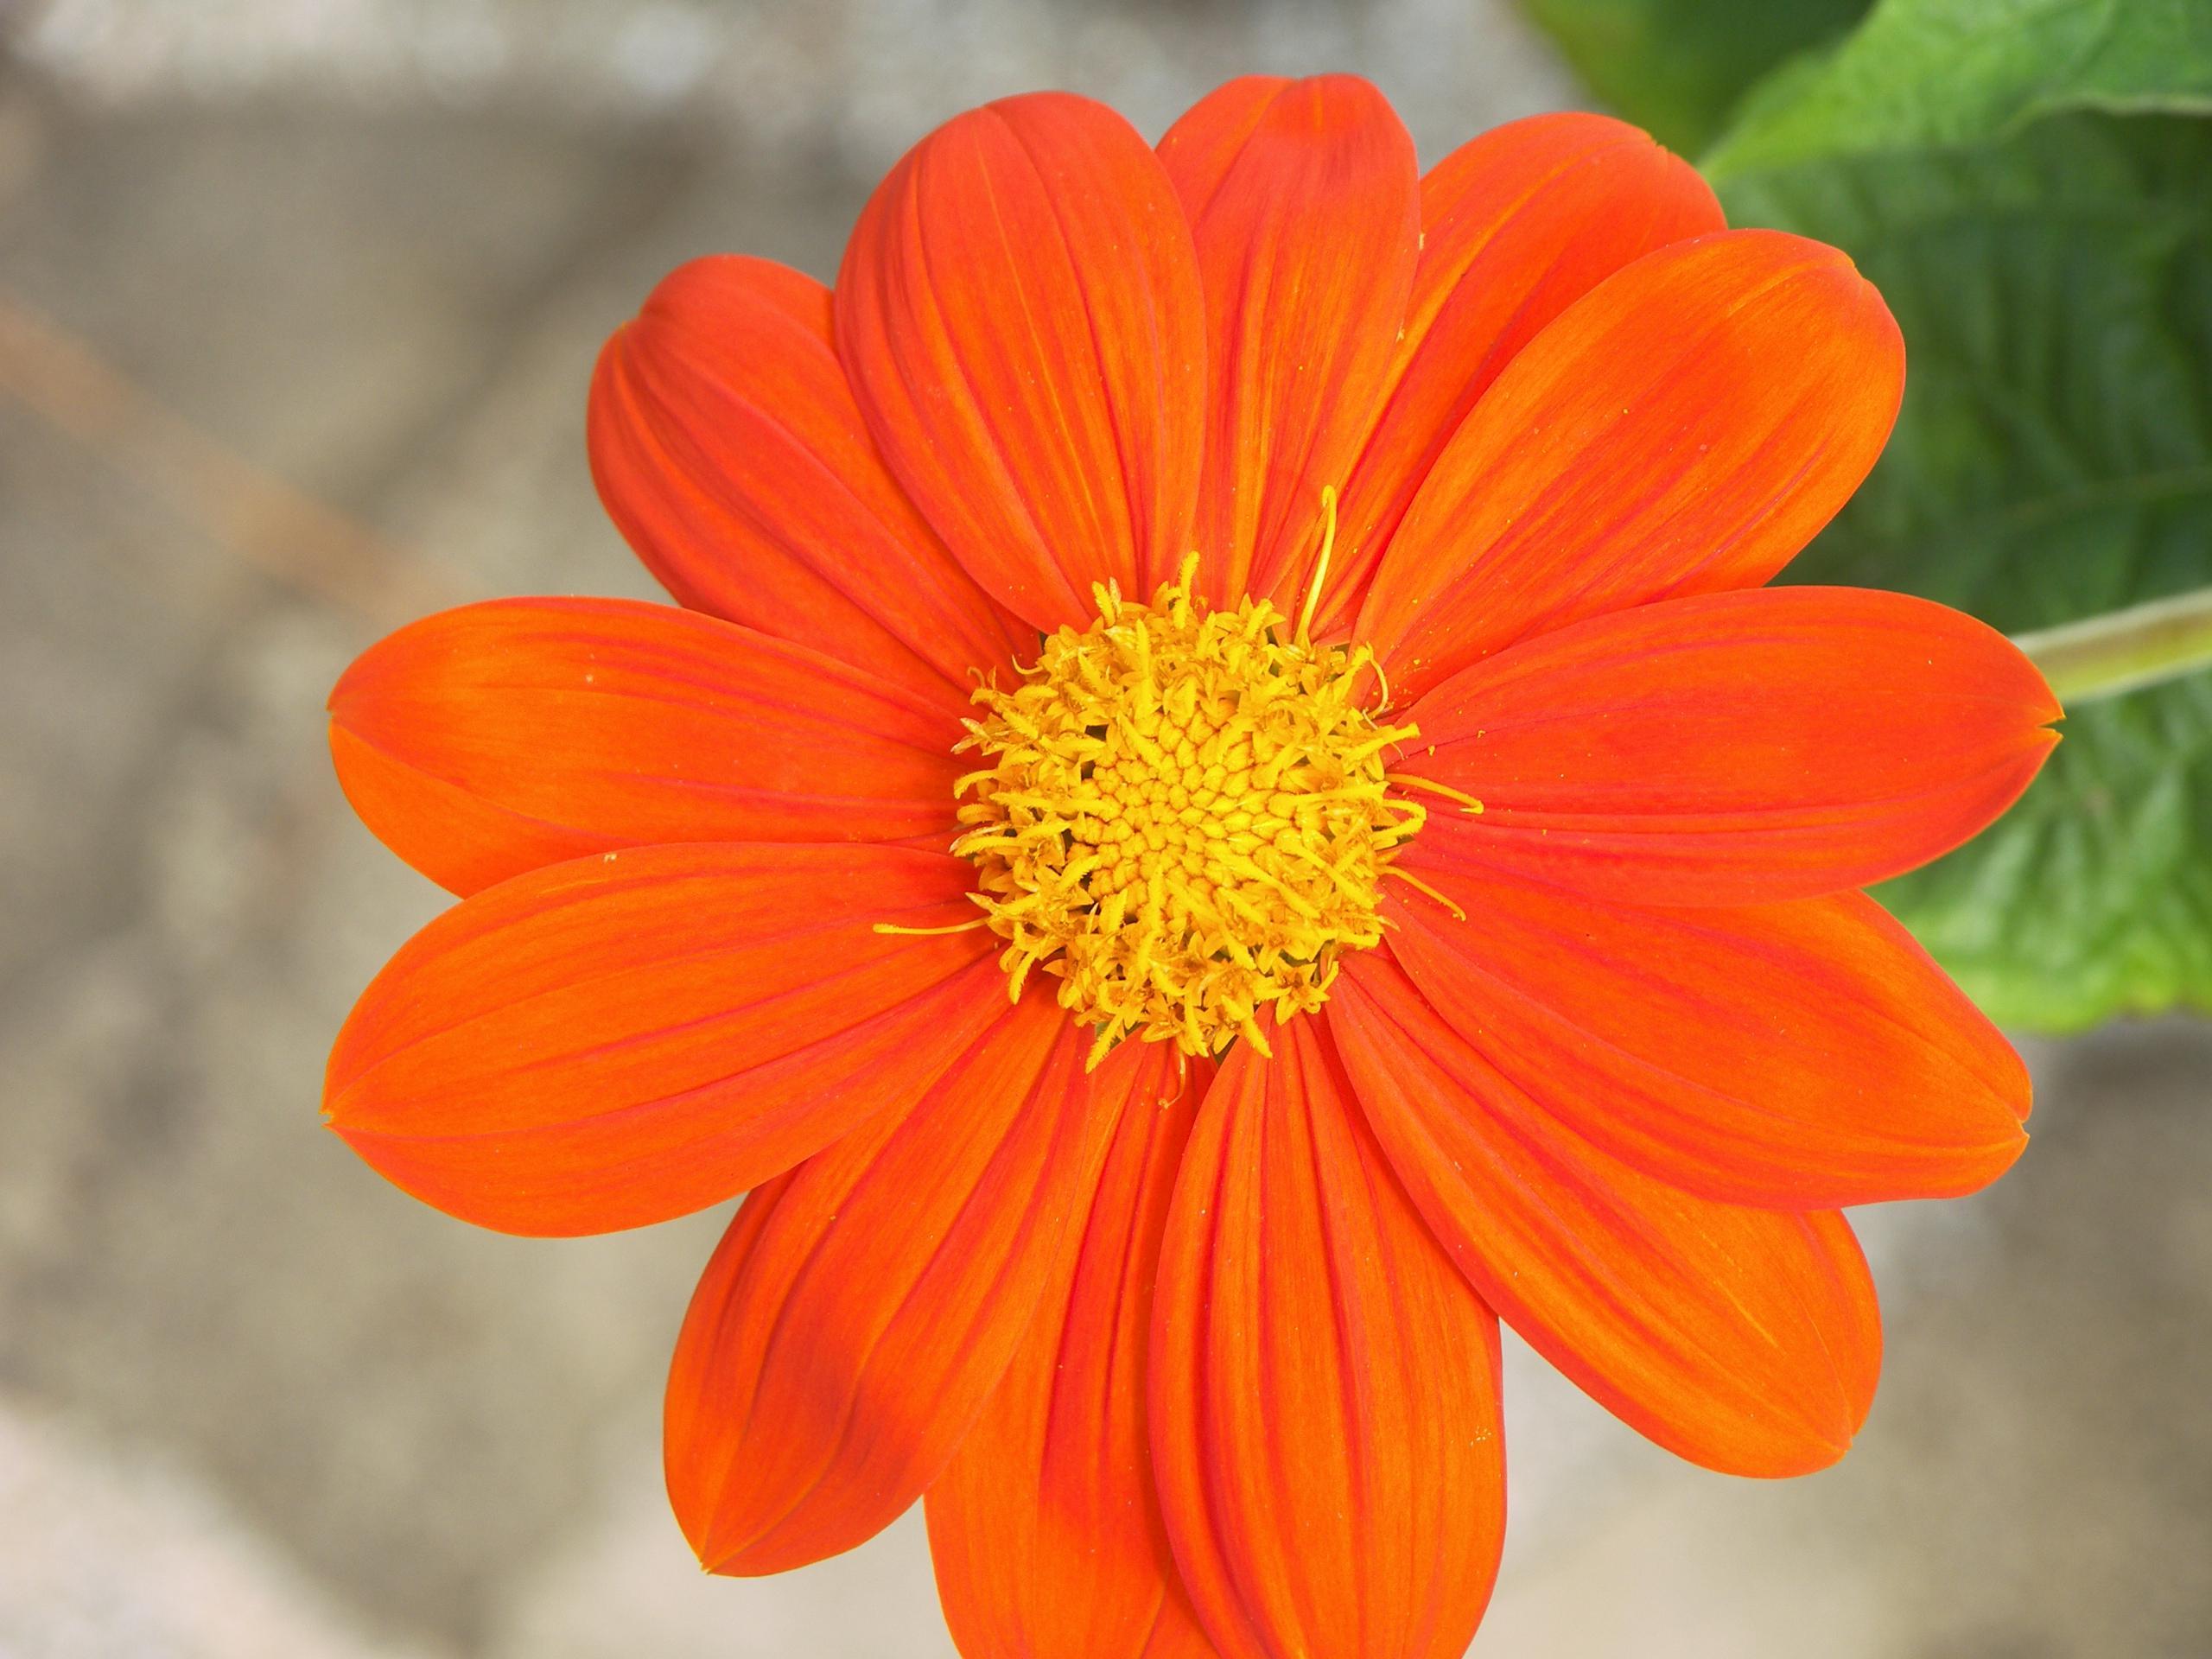 Free Photo Orange Petal Flower Orange Growth Garden Free